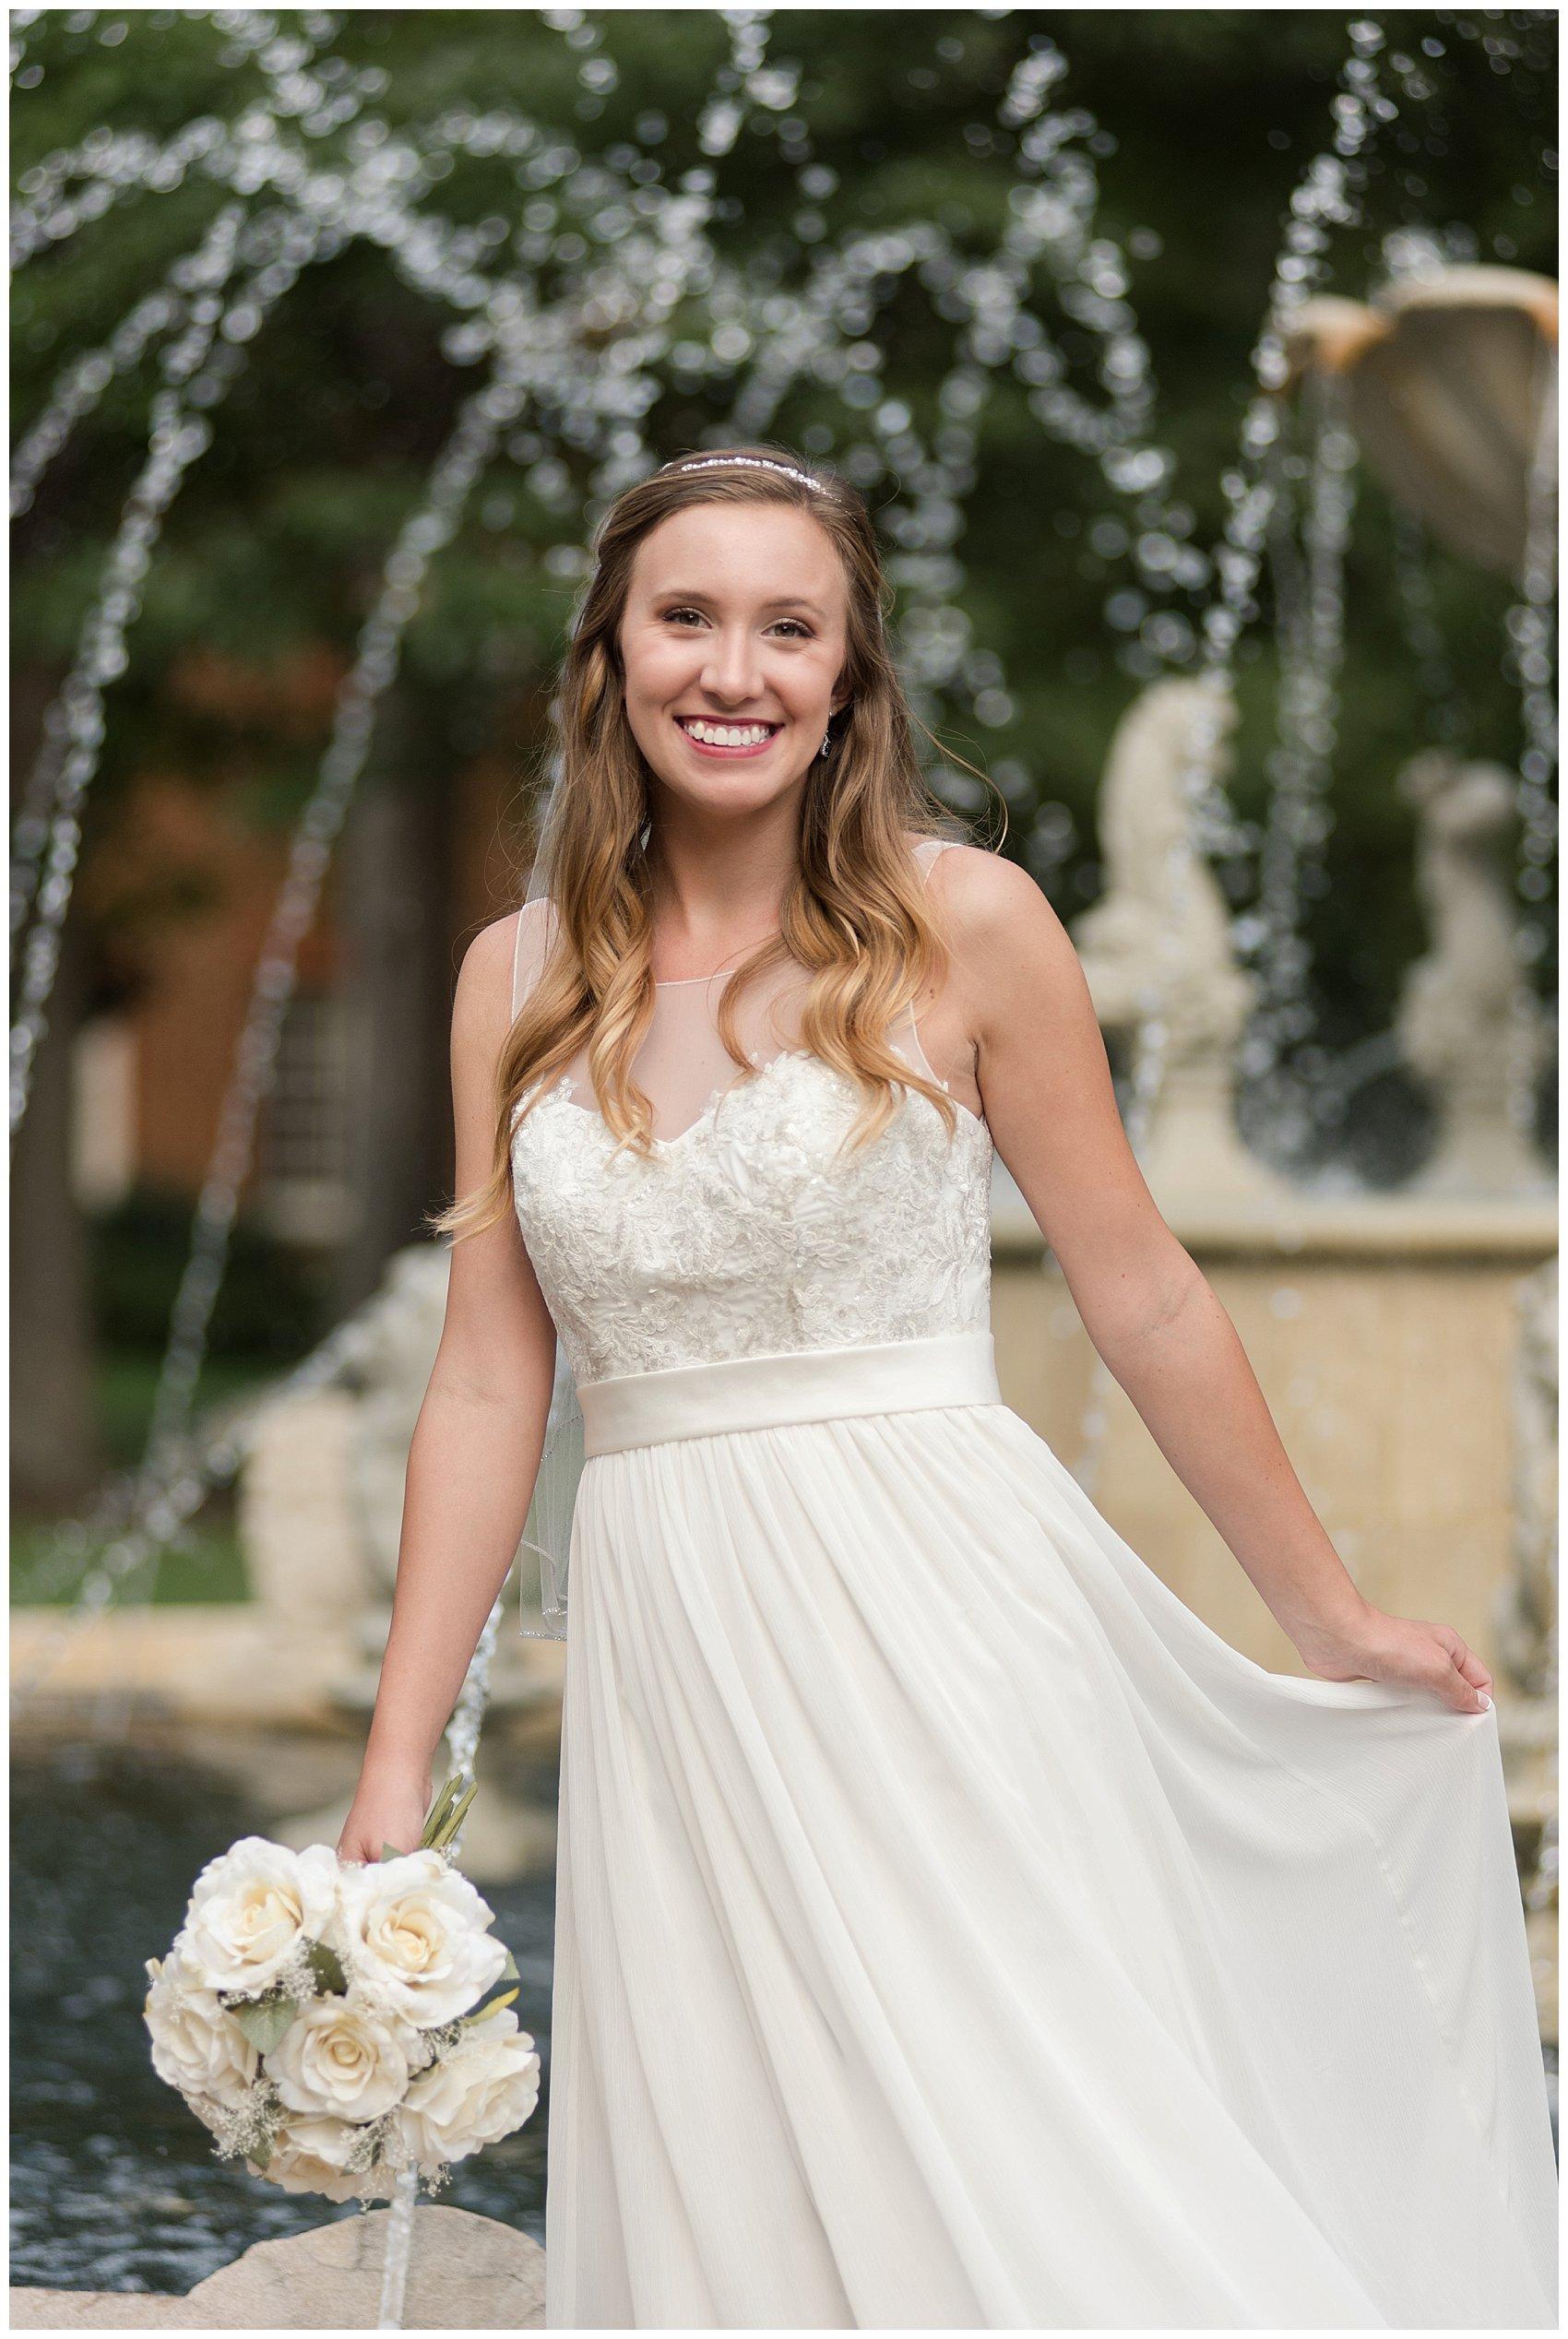 Blush Pink Summer Virginia Beach Wedding Regent University Founders Inn Bride and Groom Wedding Photographers_6064